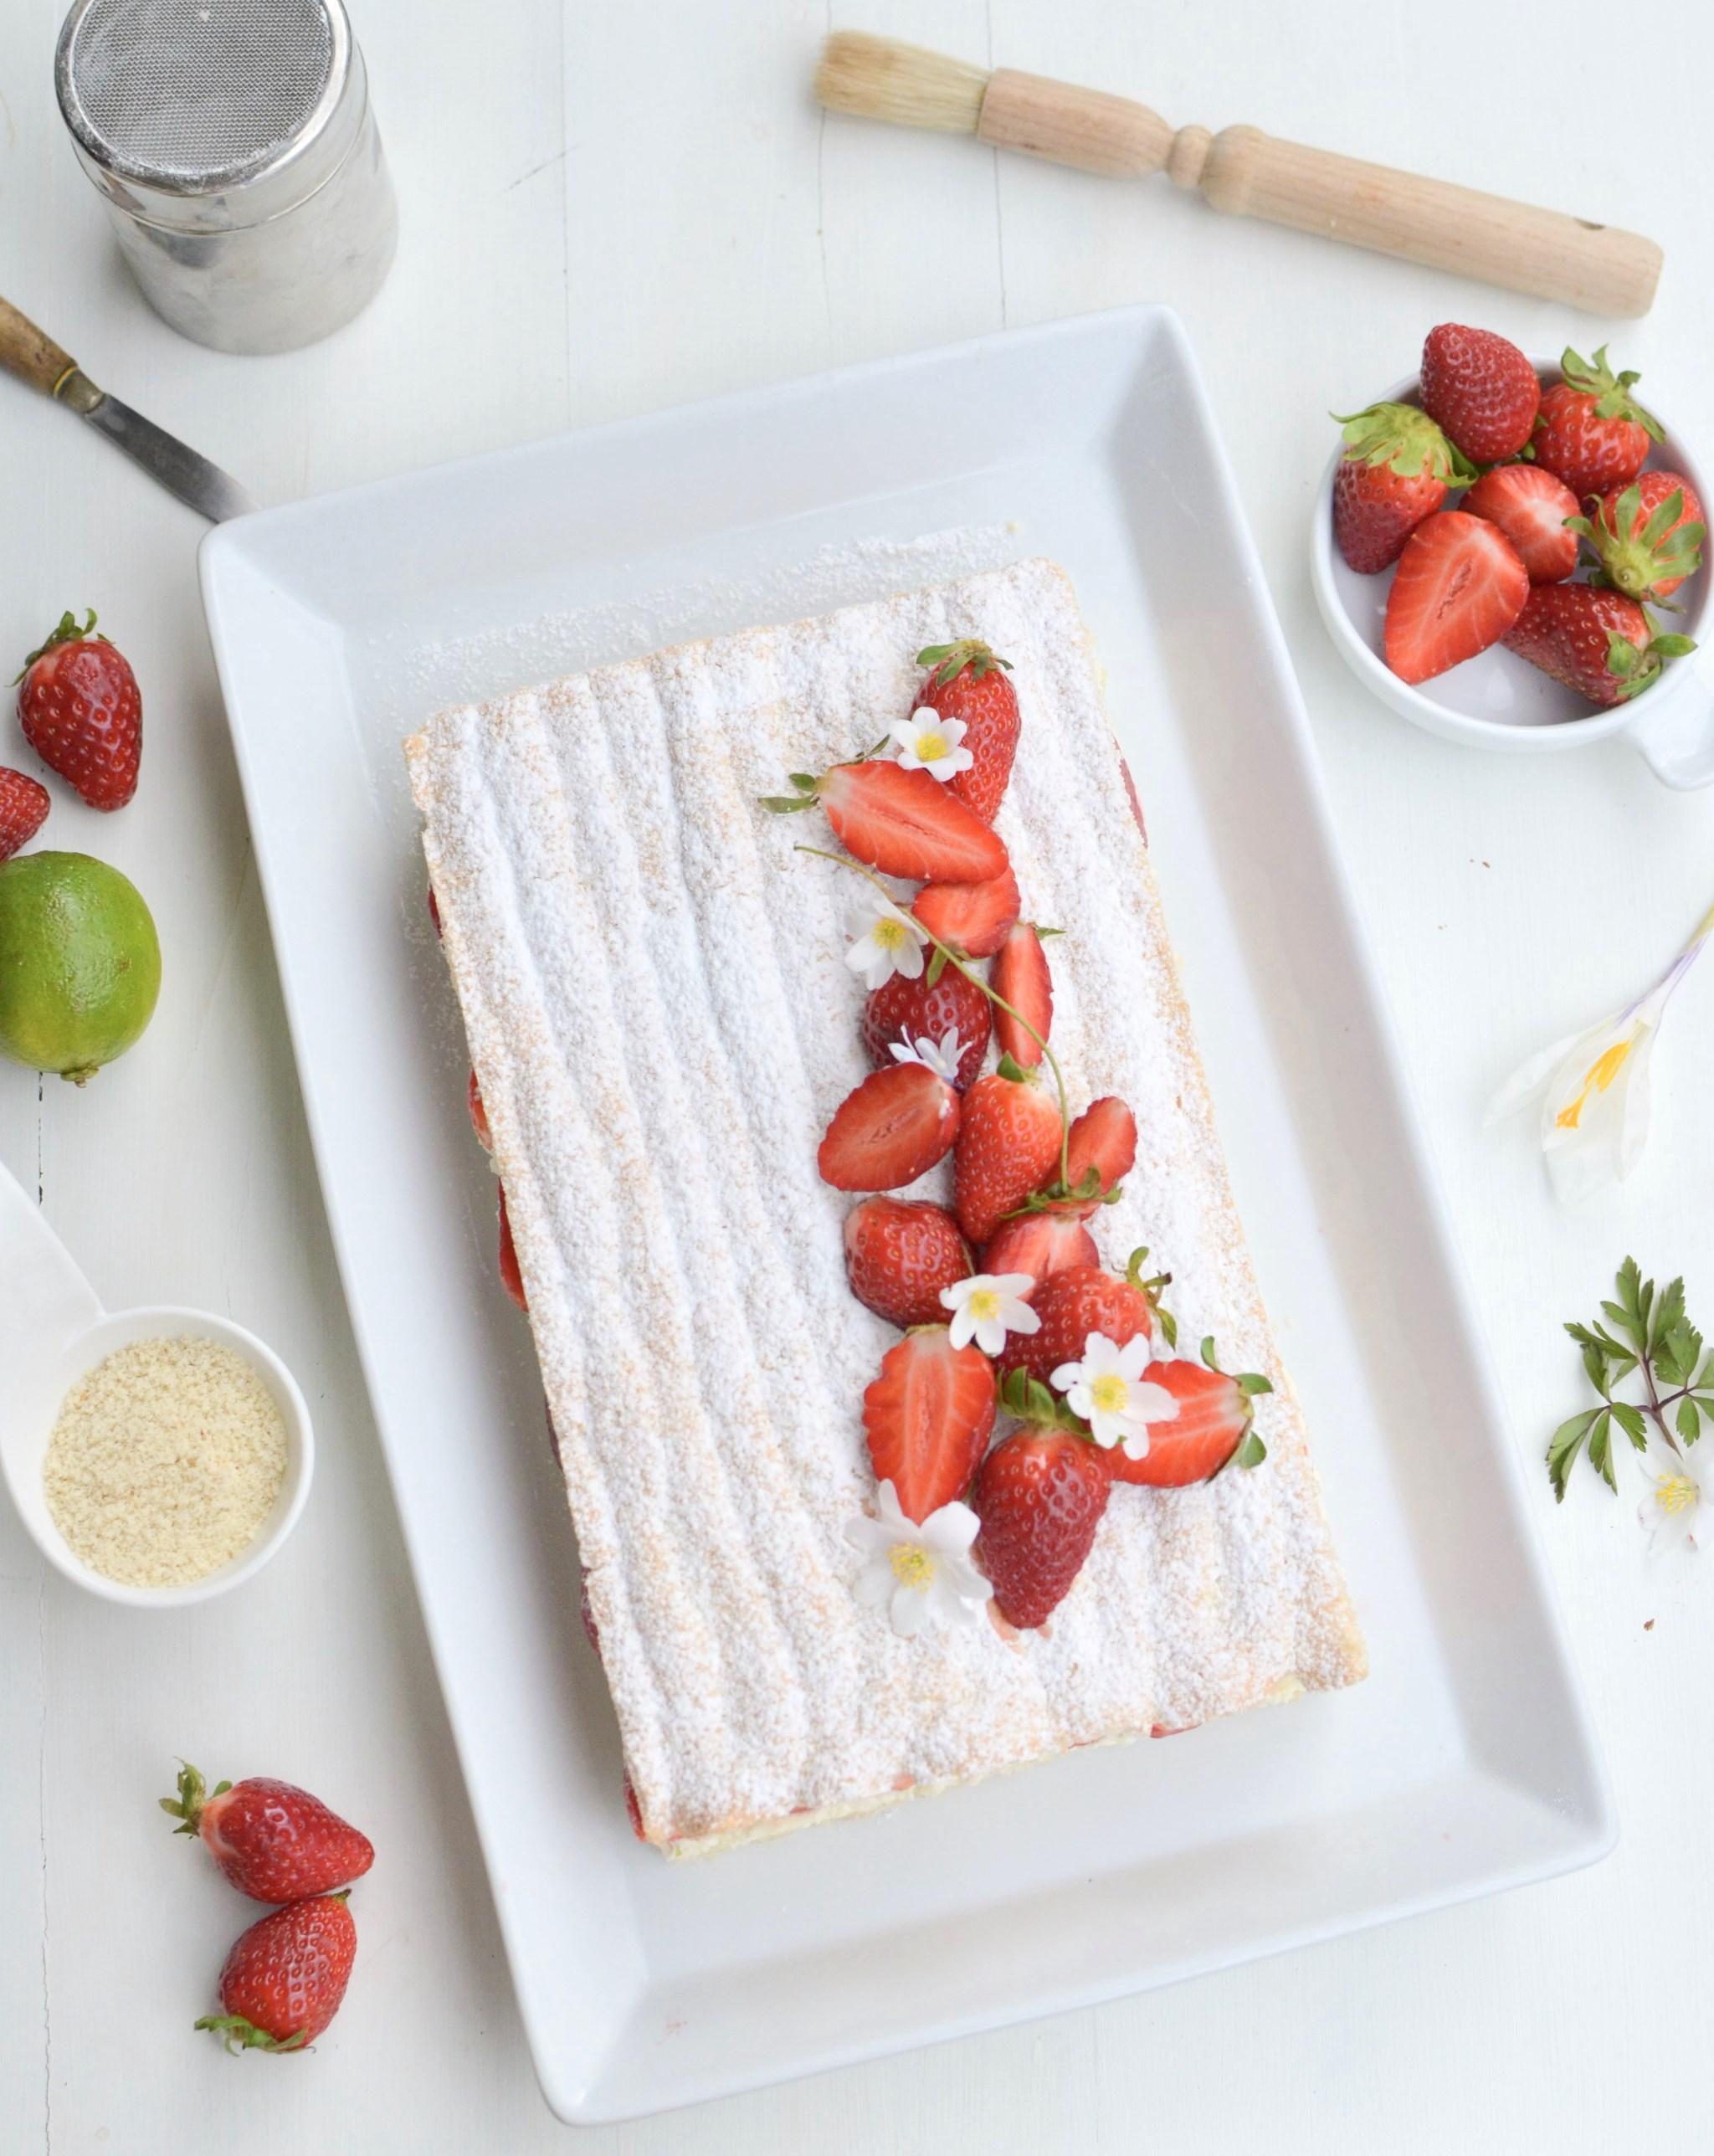 Strawberry Lime Succès cake gluten free